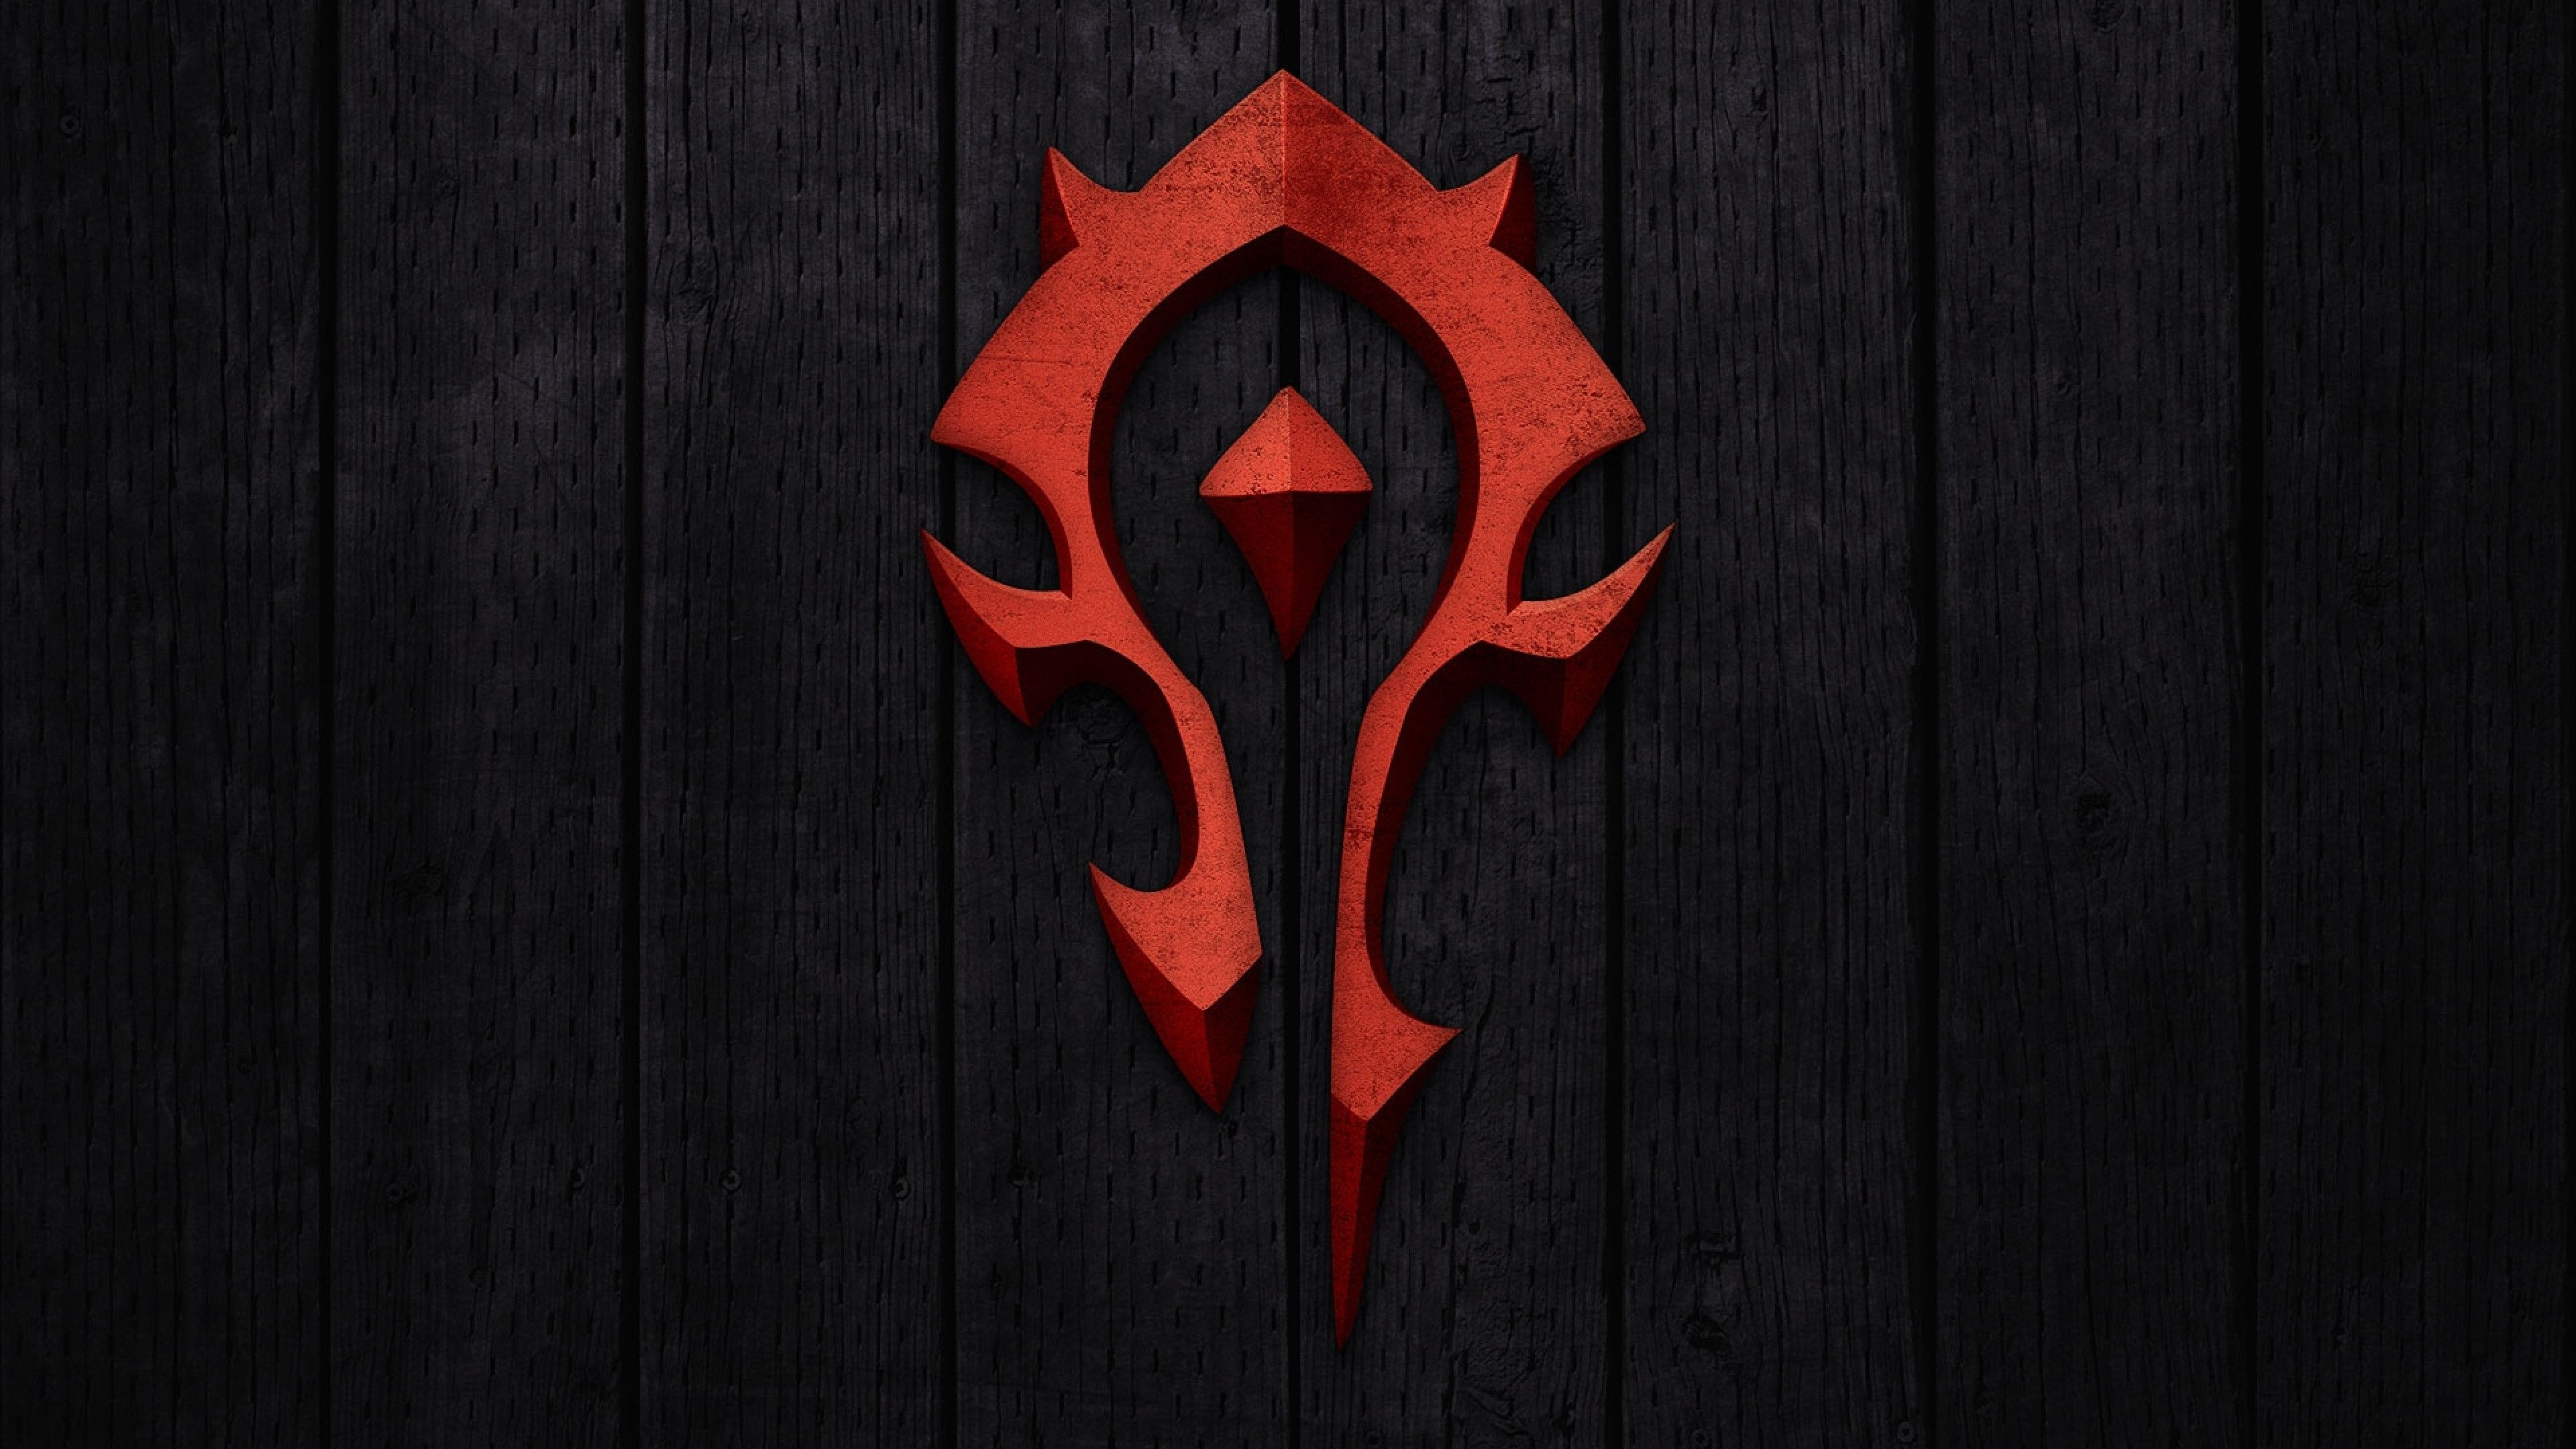 3840x2160 Wallpaper world of warcraft, horde, symbol